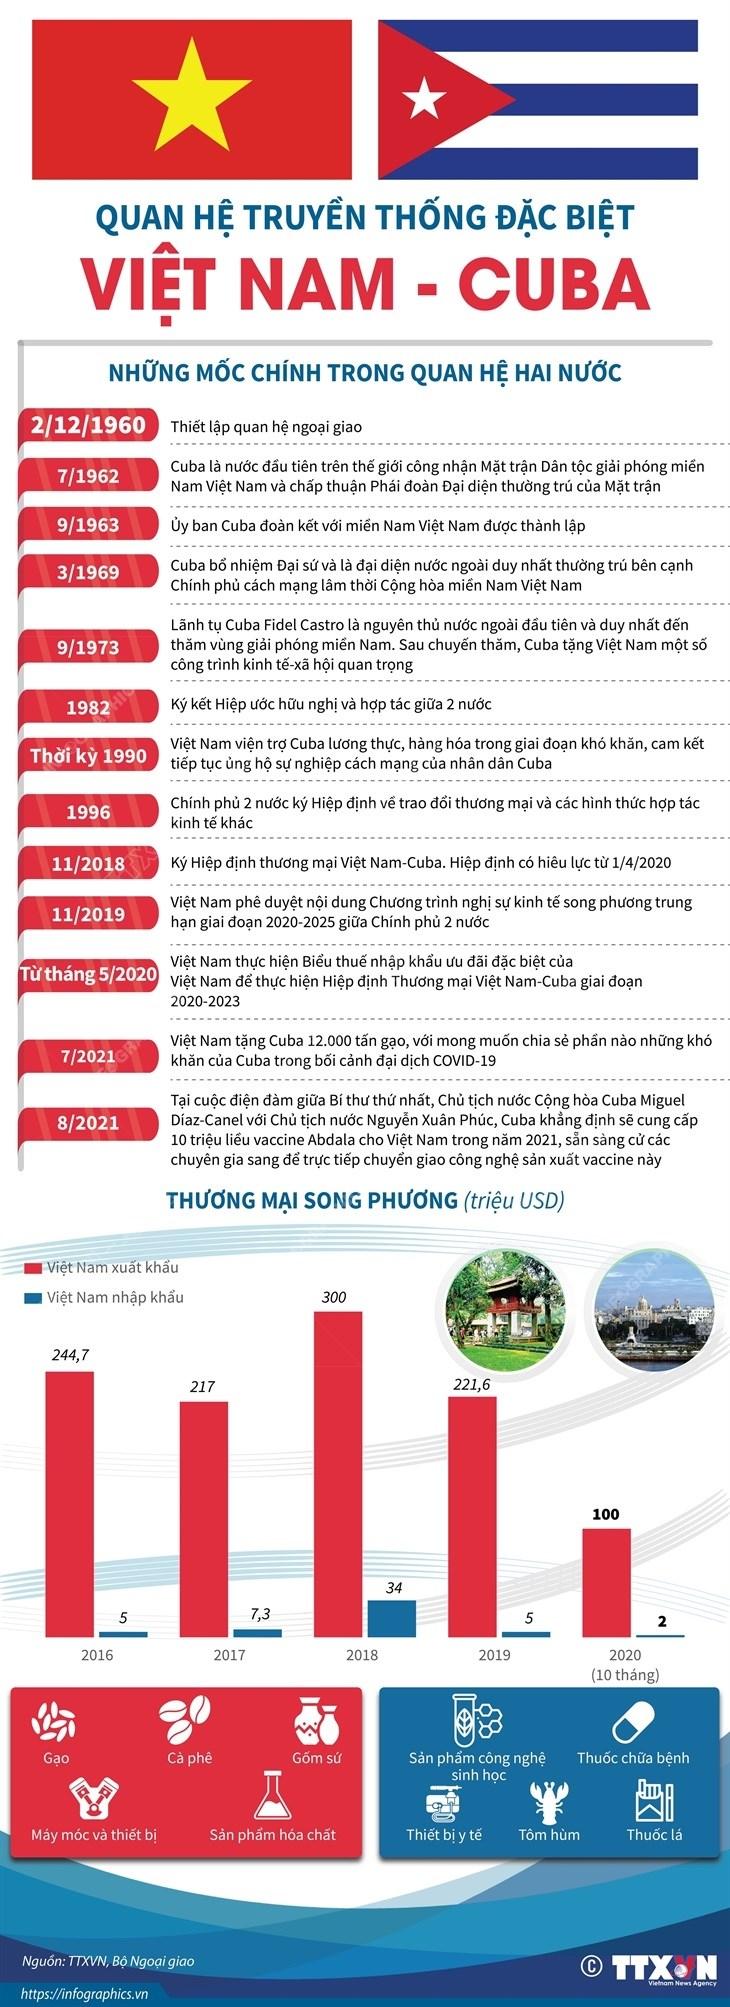 [Infographics] Quan he truyen thong dac biet Viet Nam-Cuba hinh anh 1